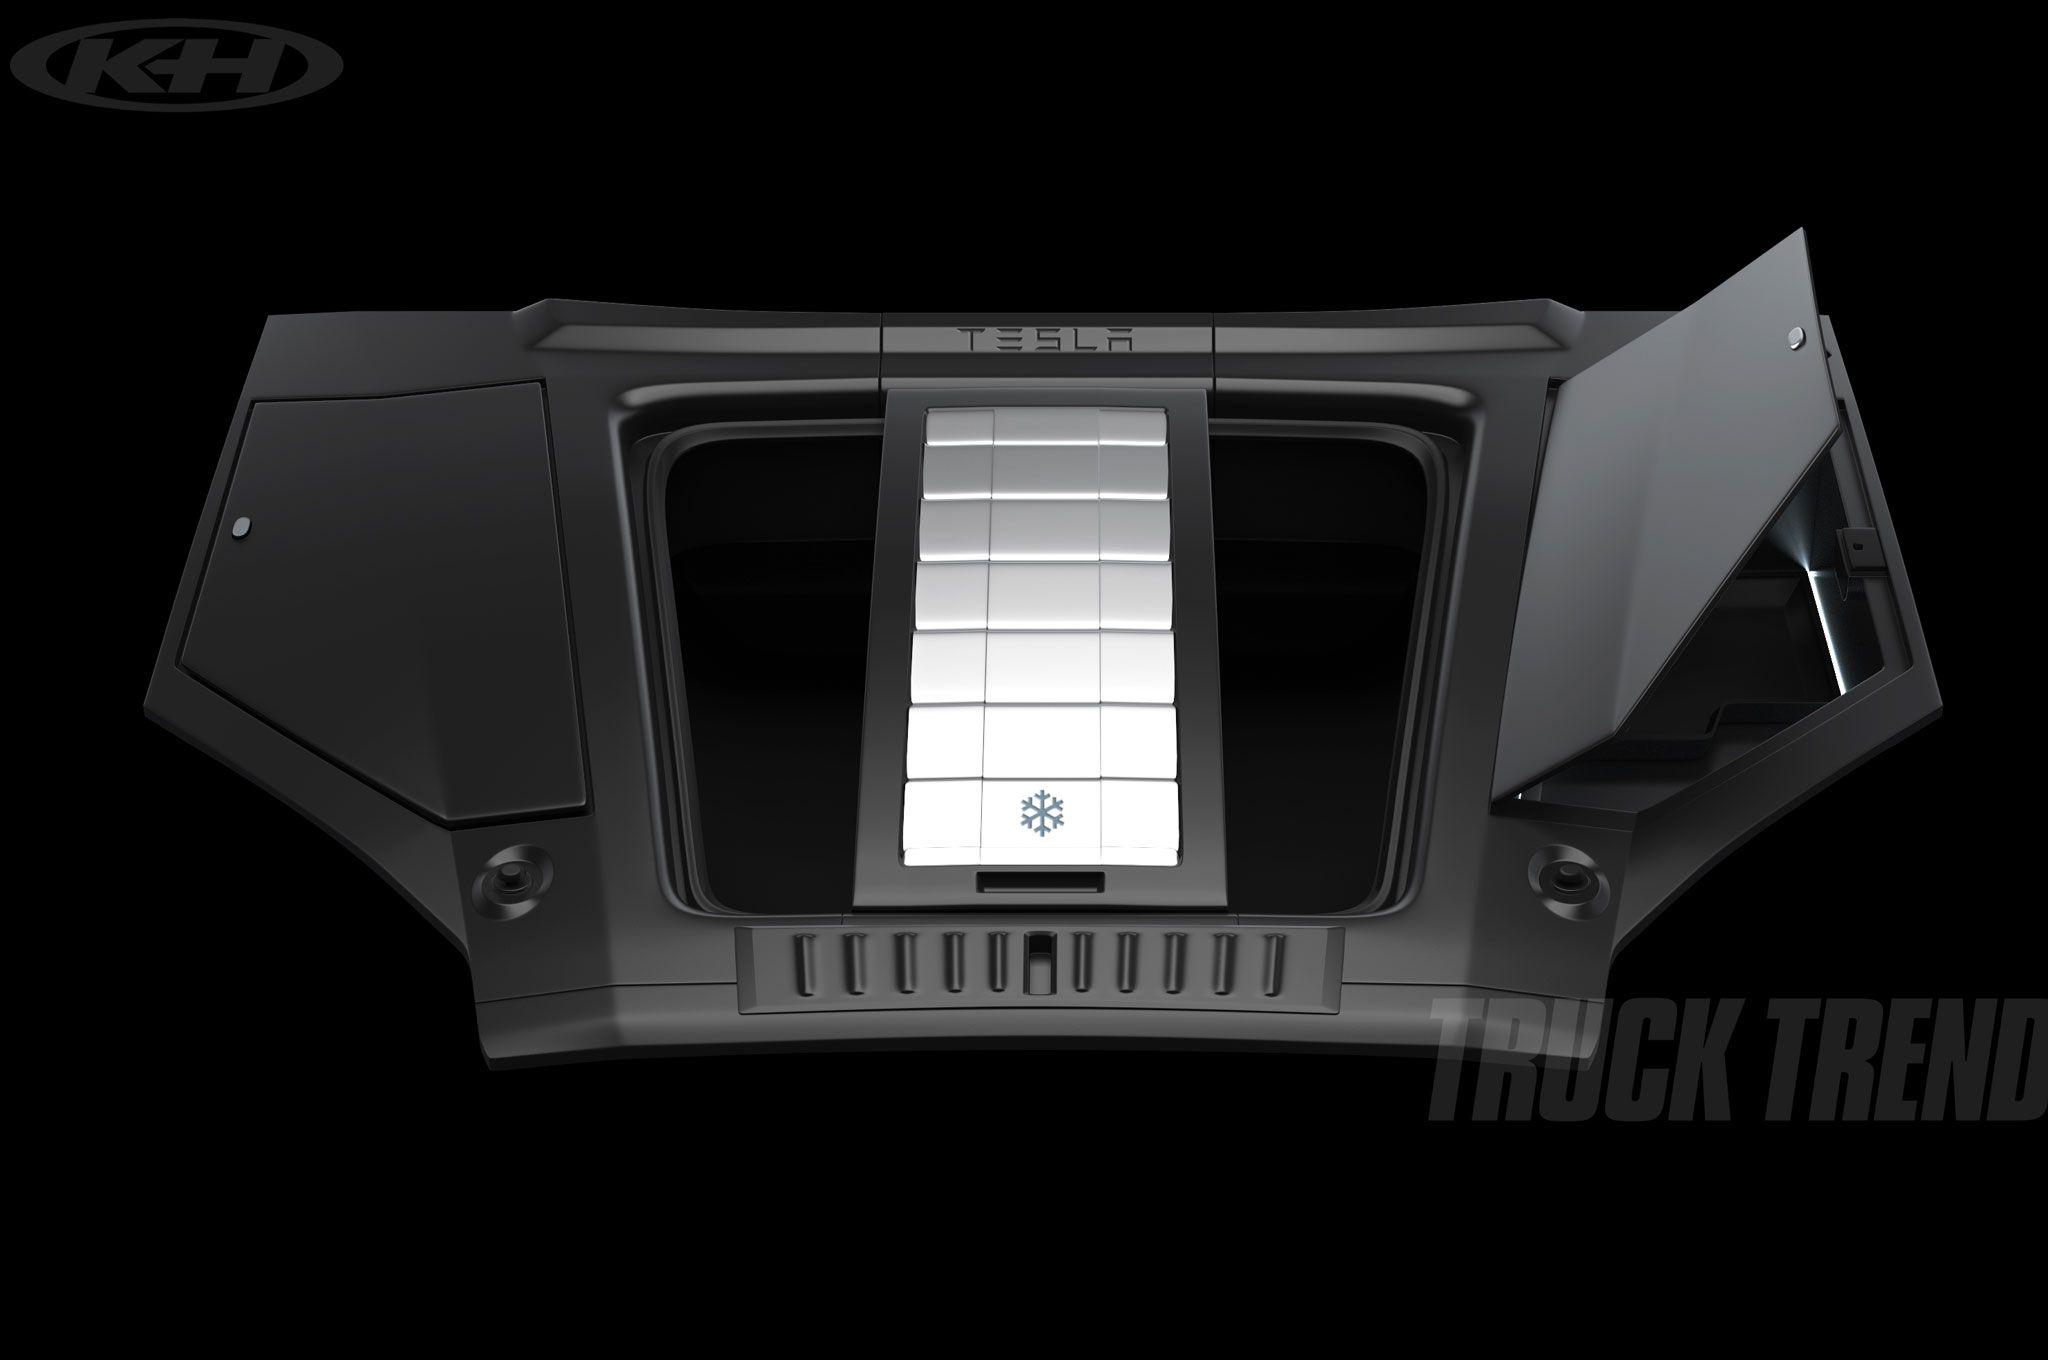 tesla-pickup-truck-frunk-front